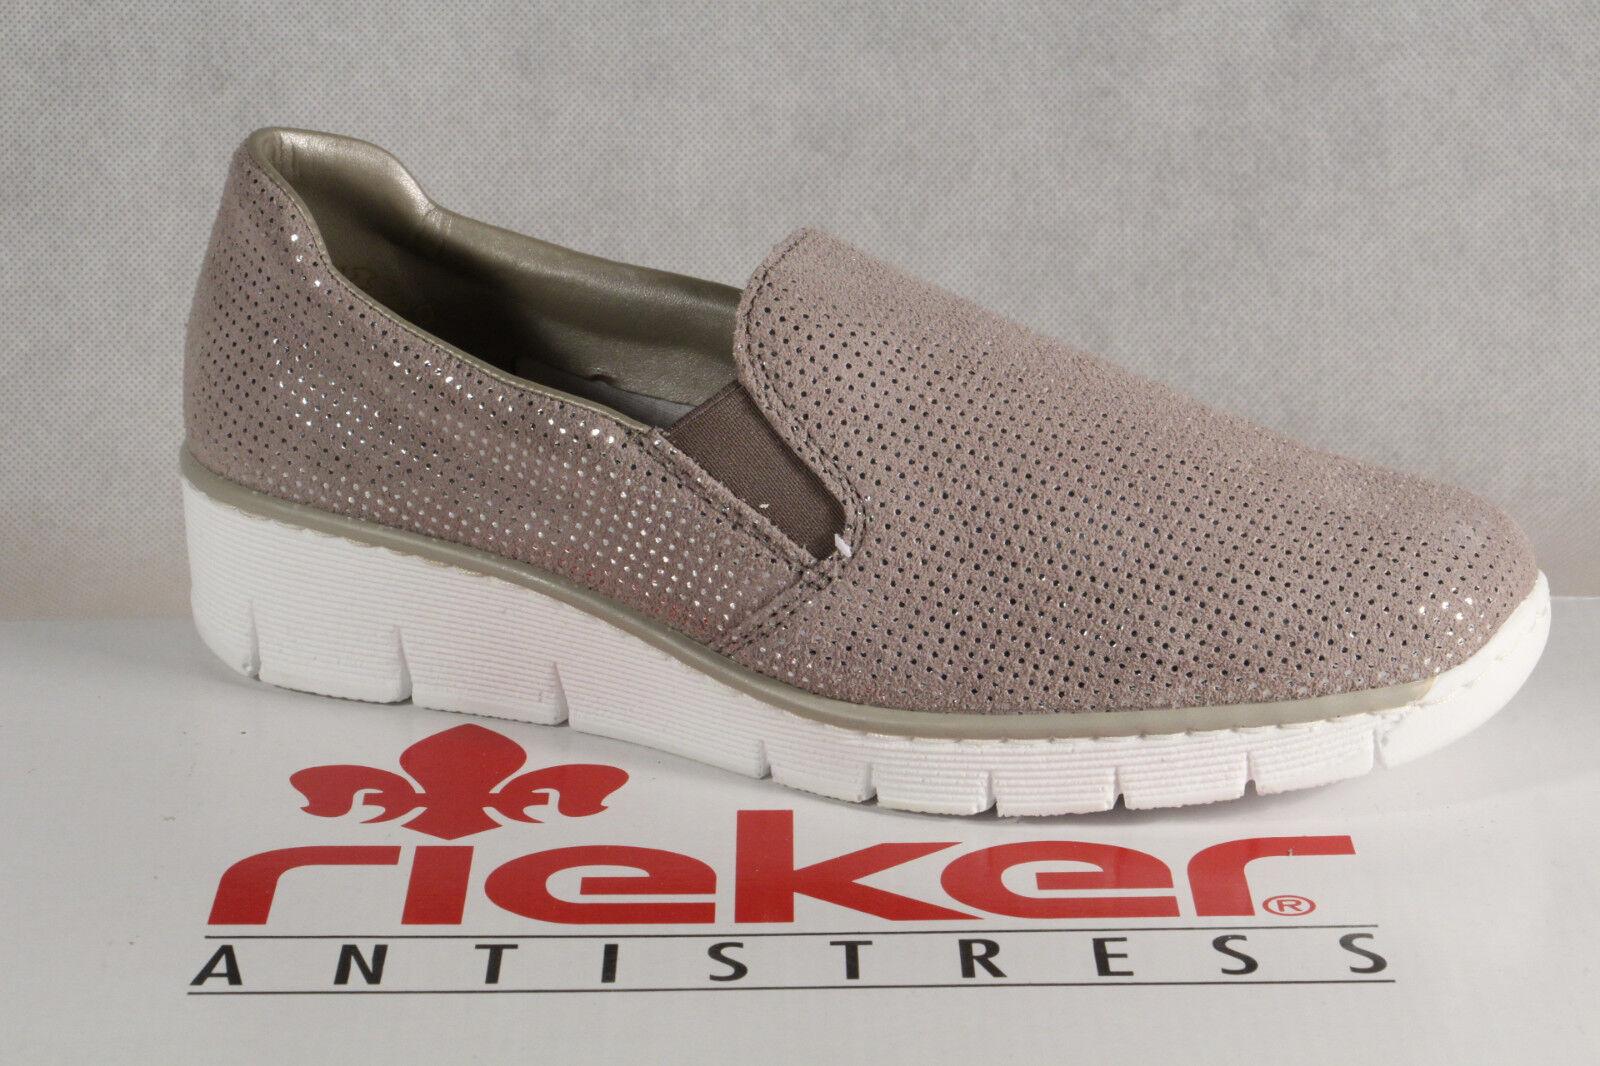 RIEKER Slipper ballerine Sneakers Scarpe Basse Scarpe Sportive ballerine Slipper grigio 53766 NUOVO afad47